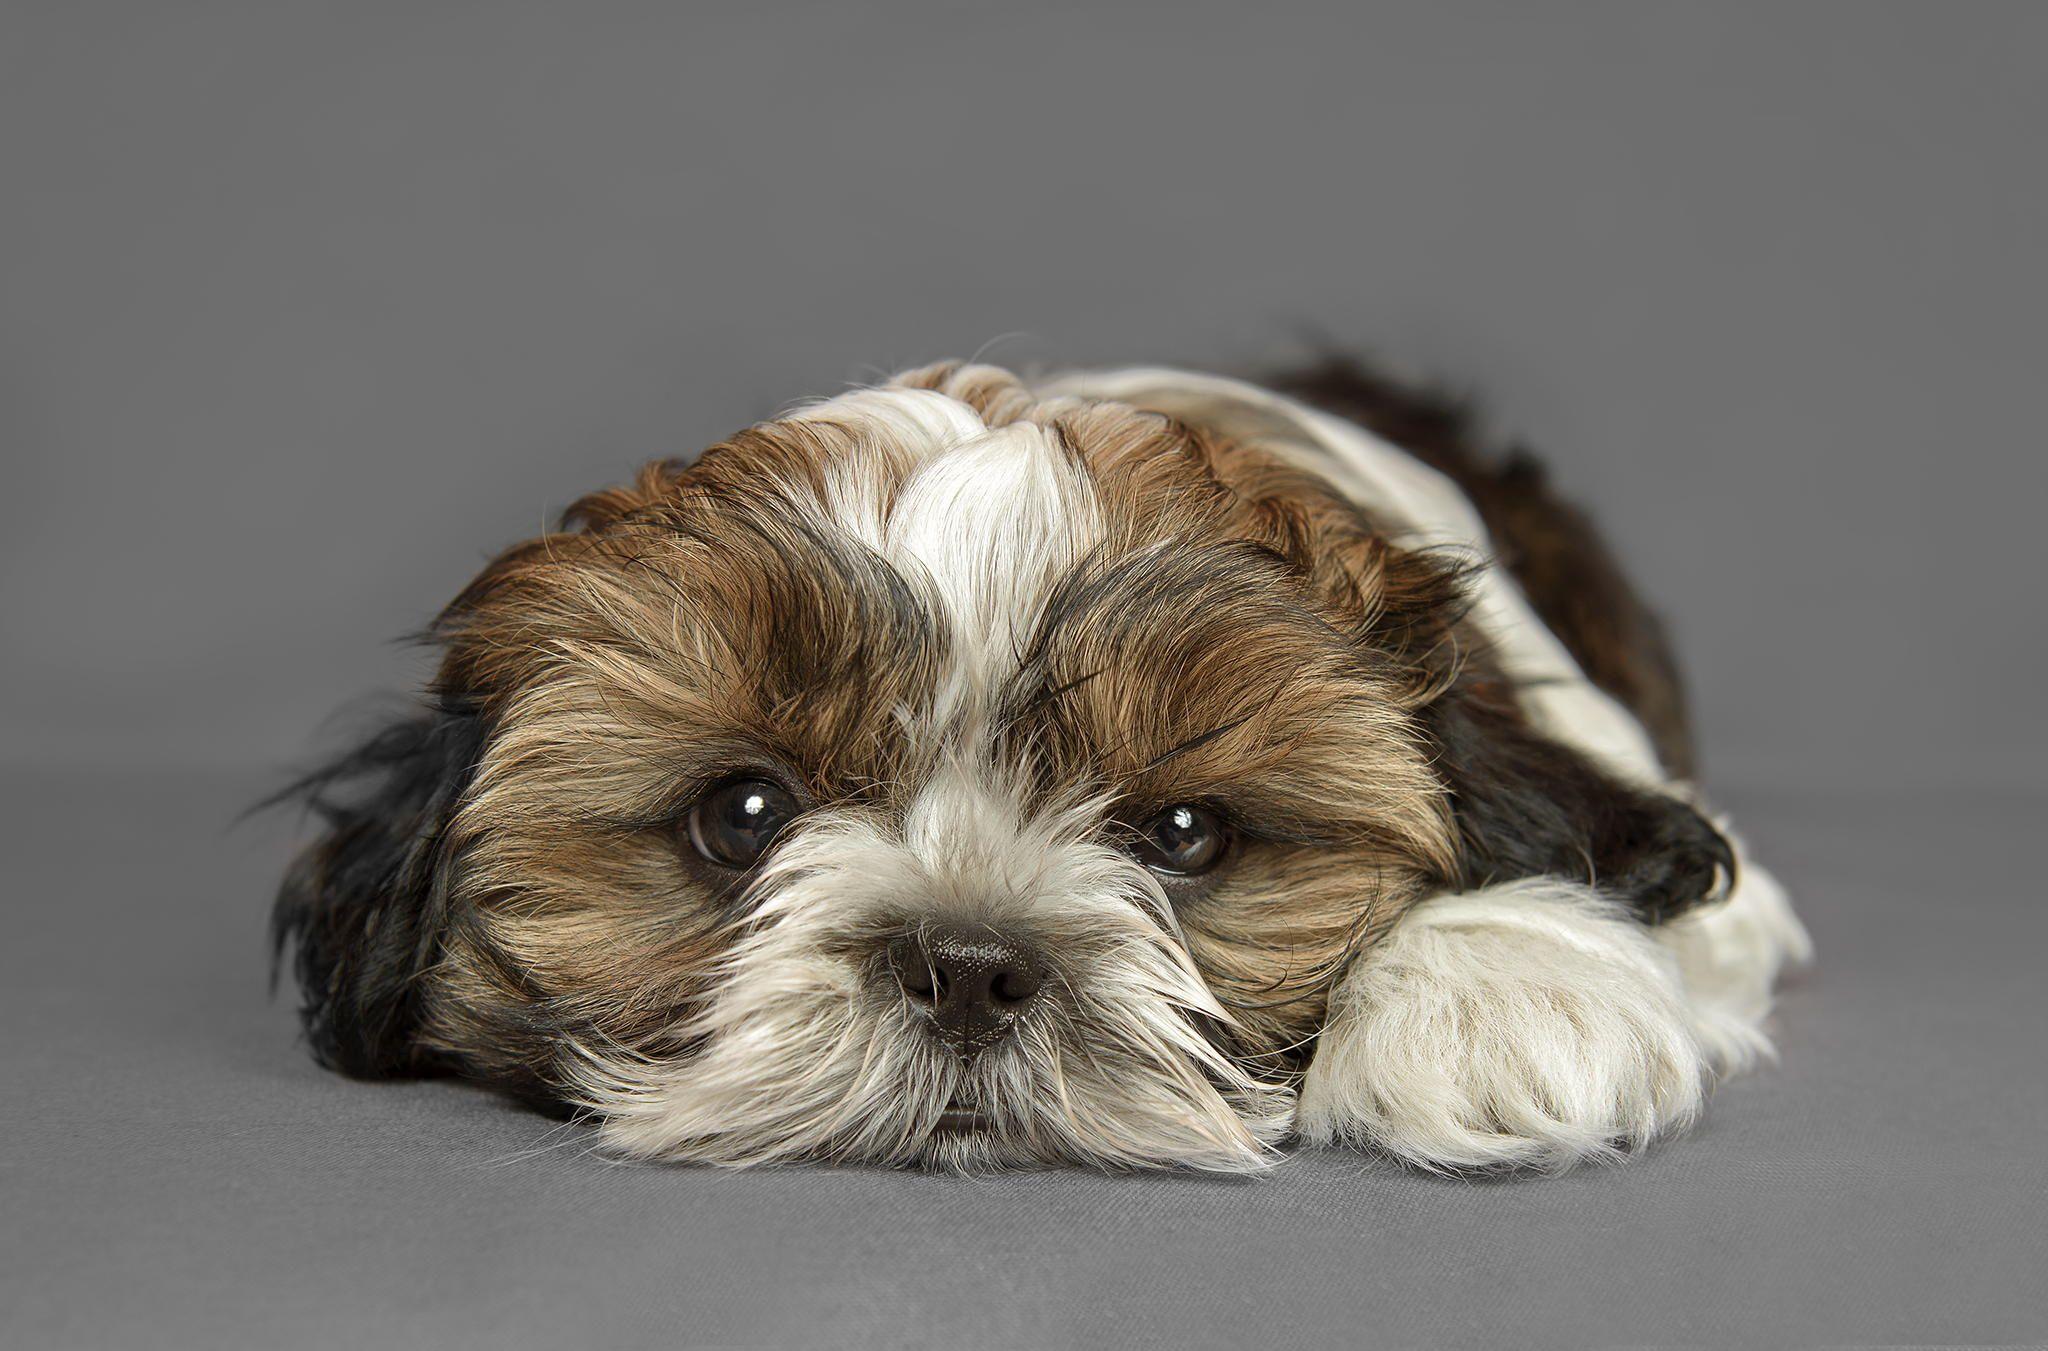 Evis Lovely Shih Tzu Puppy Miki A Aranka Shih Tzu Shih Tzu